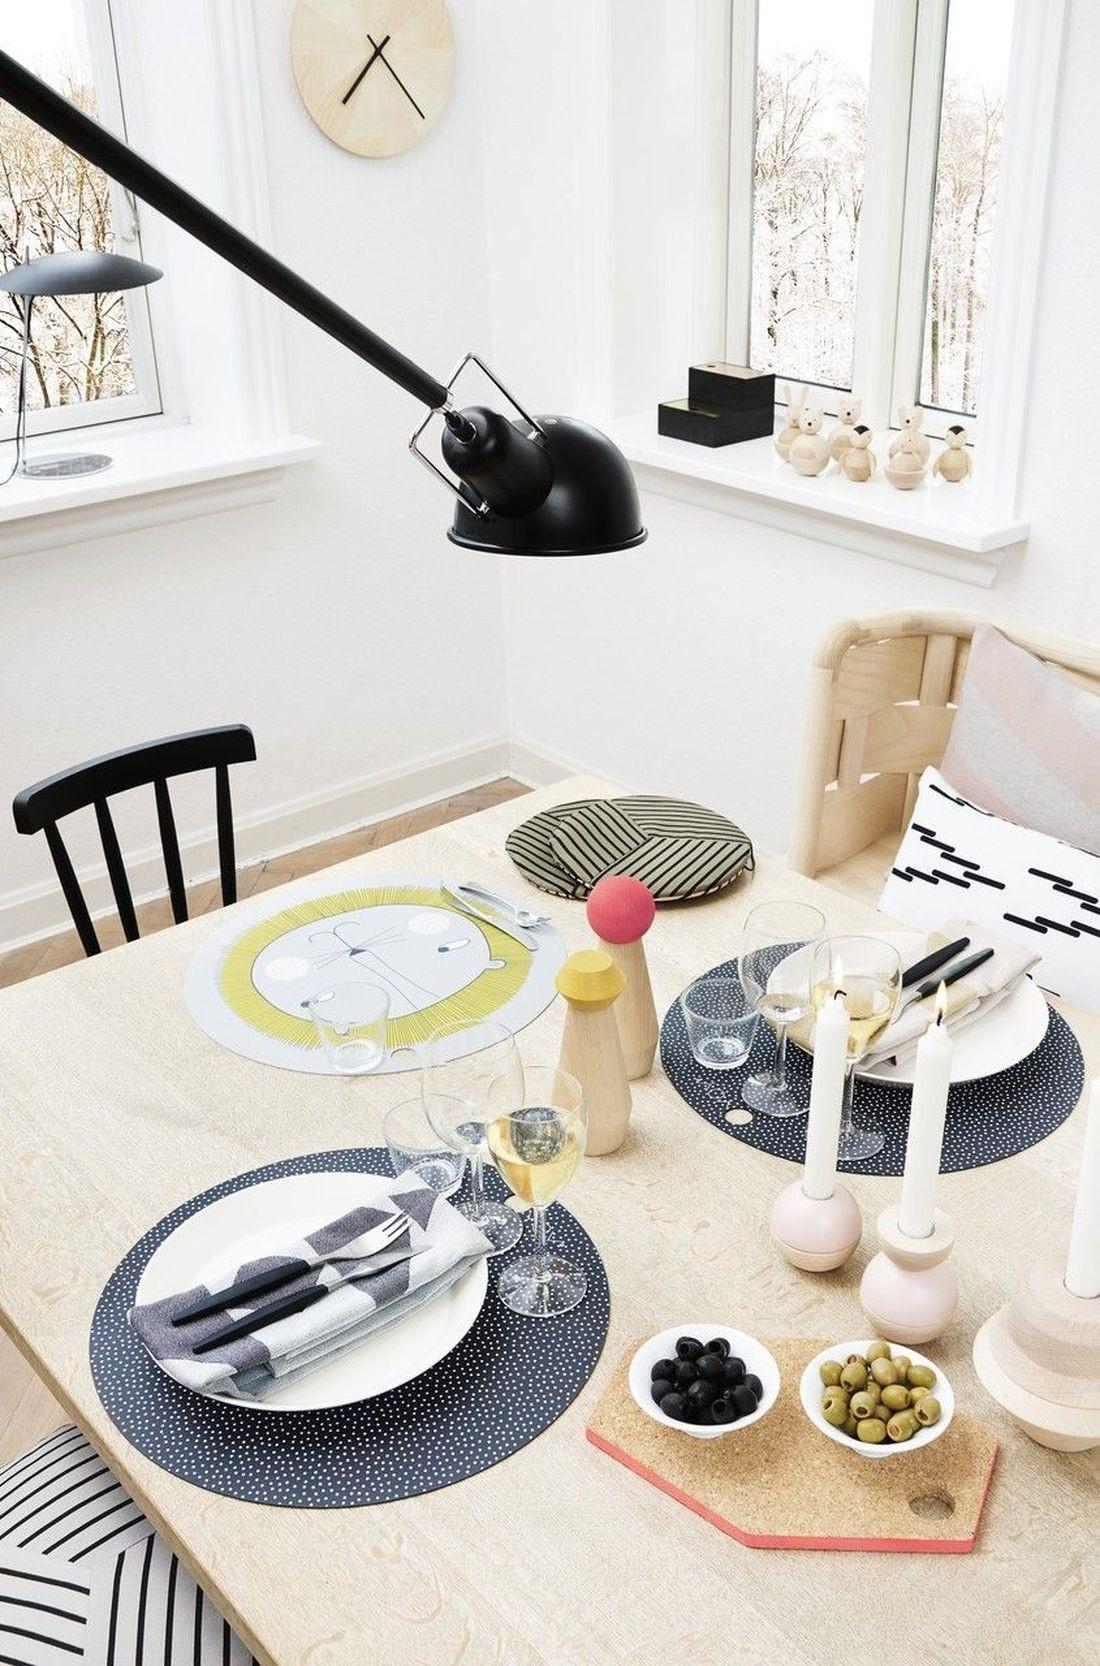 kinder tisch set oyoy slinkii kleine fabriek. Black Bedroom Furniture Sets. Home Design Ideas